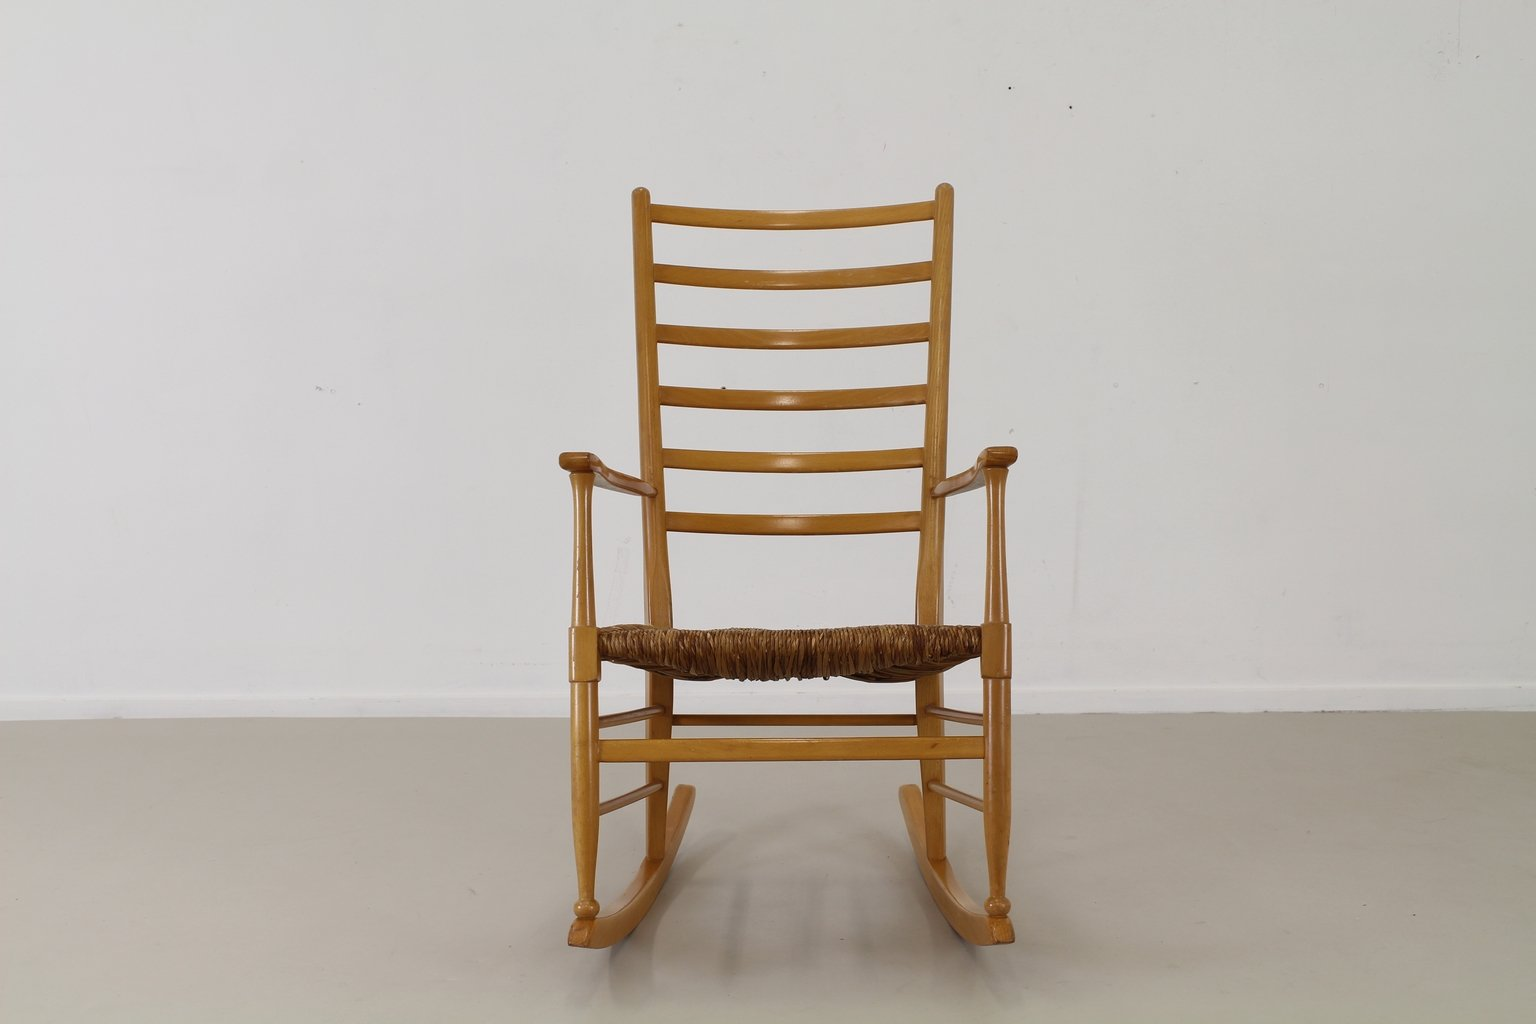 Niederl ndischer schaukelstuhl 1965 bei pamono kaufen for Schaukelstuhl skandinavisch